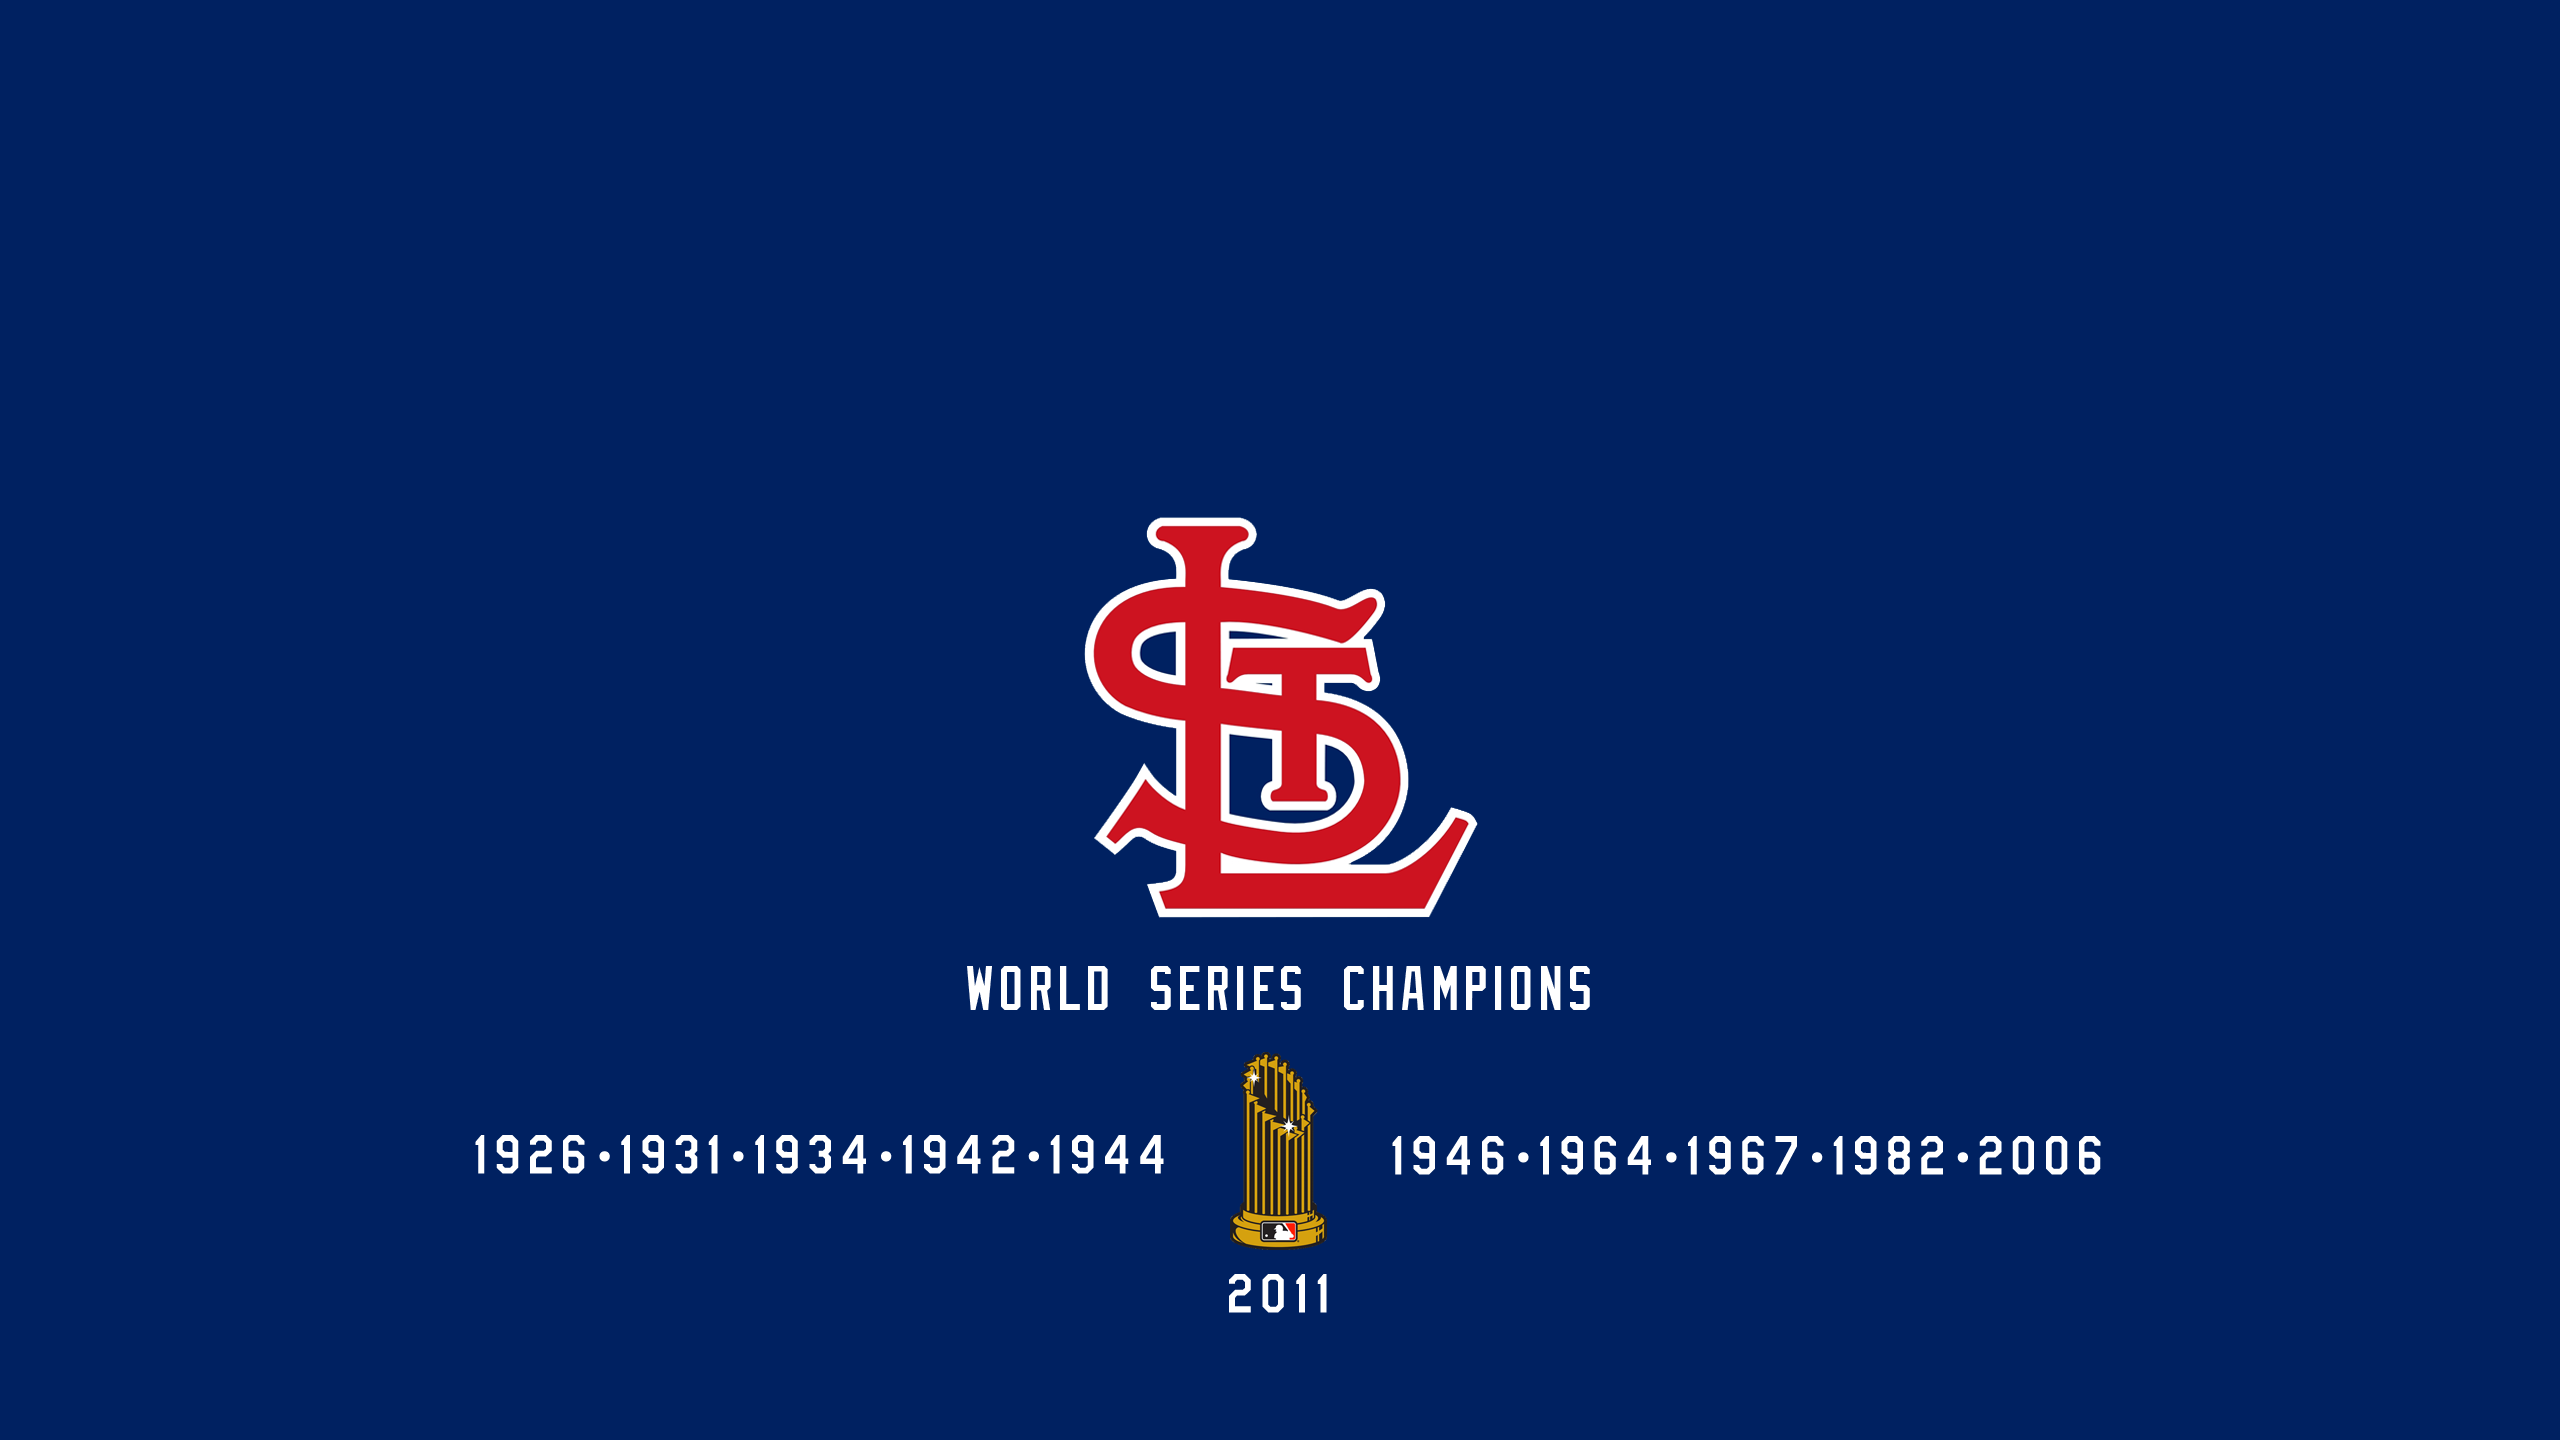 St. Louis Cardinals - World Series Champs